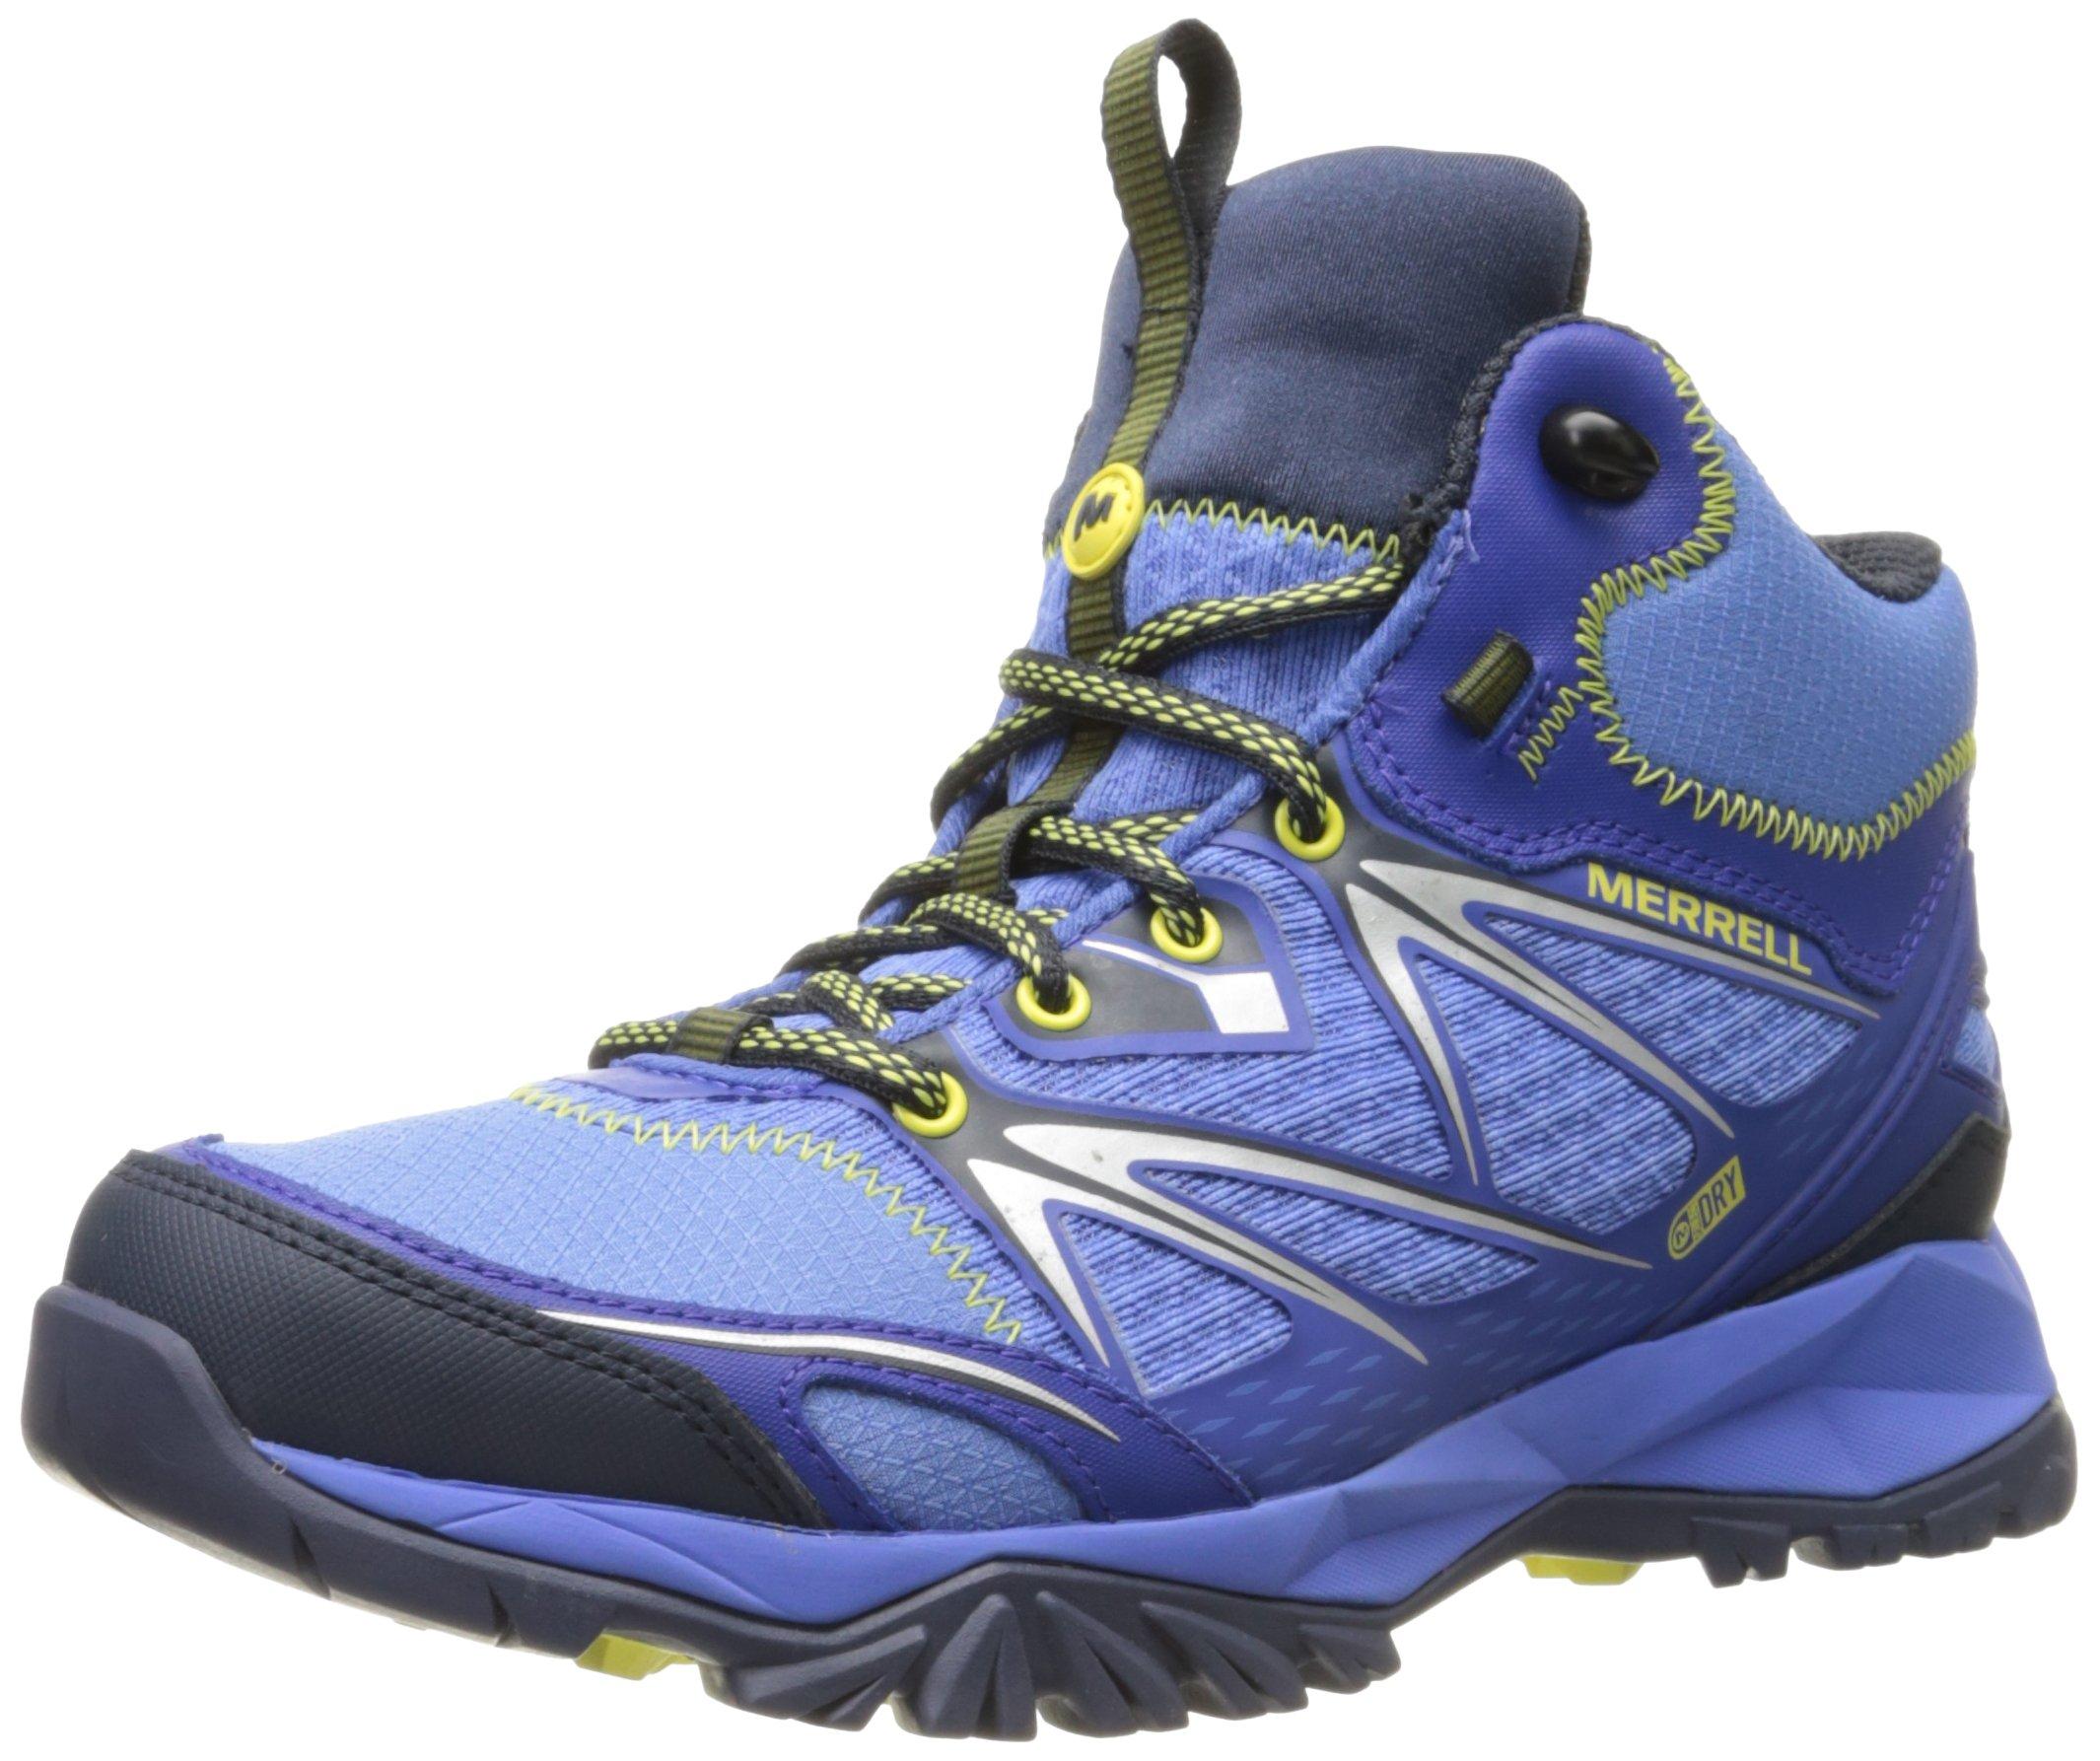 Merrell Women's Capra Bolt Mid Waterproof Hiking Boot, Purple, 6 M US